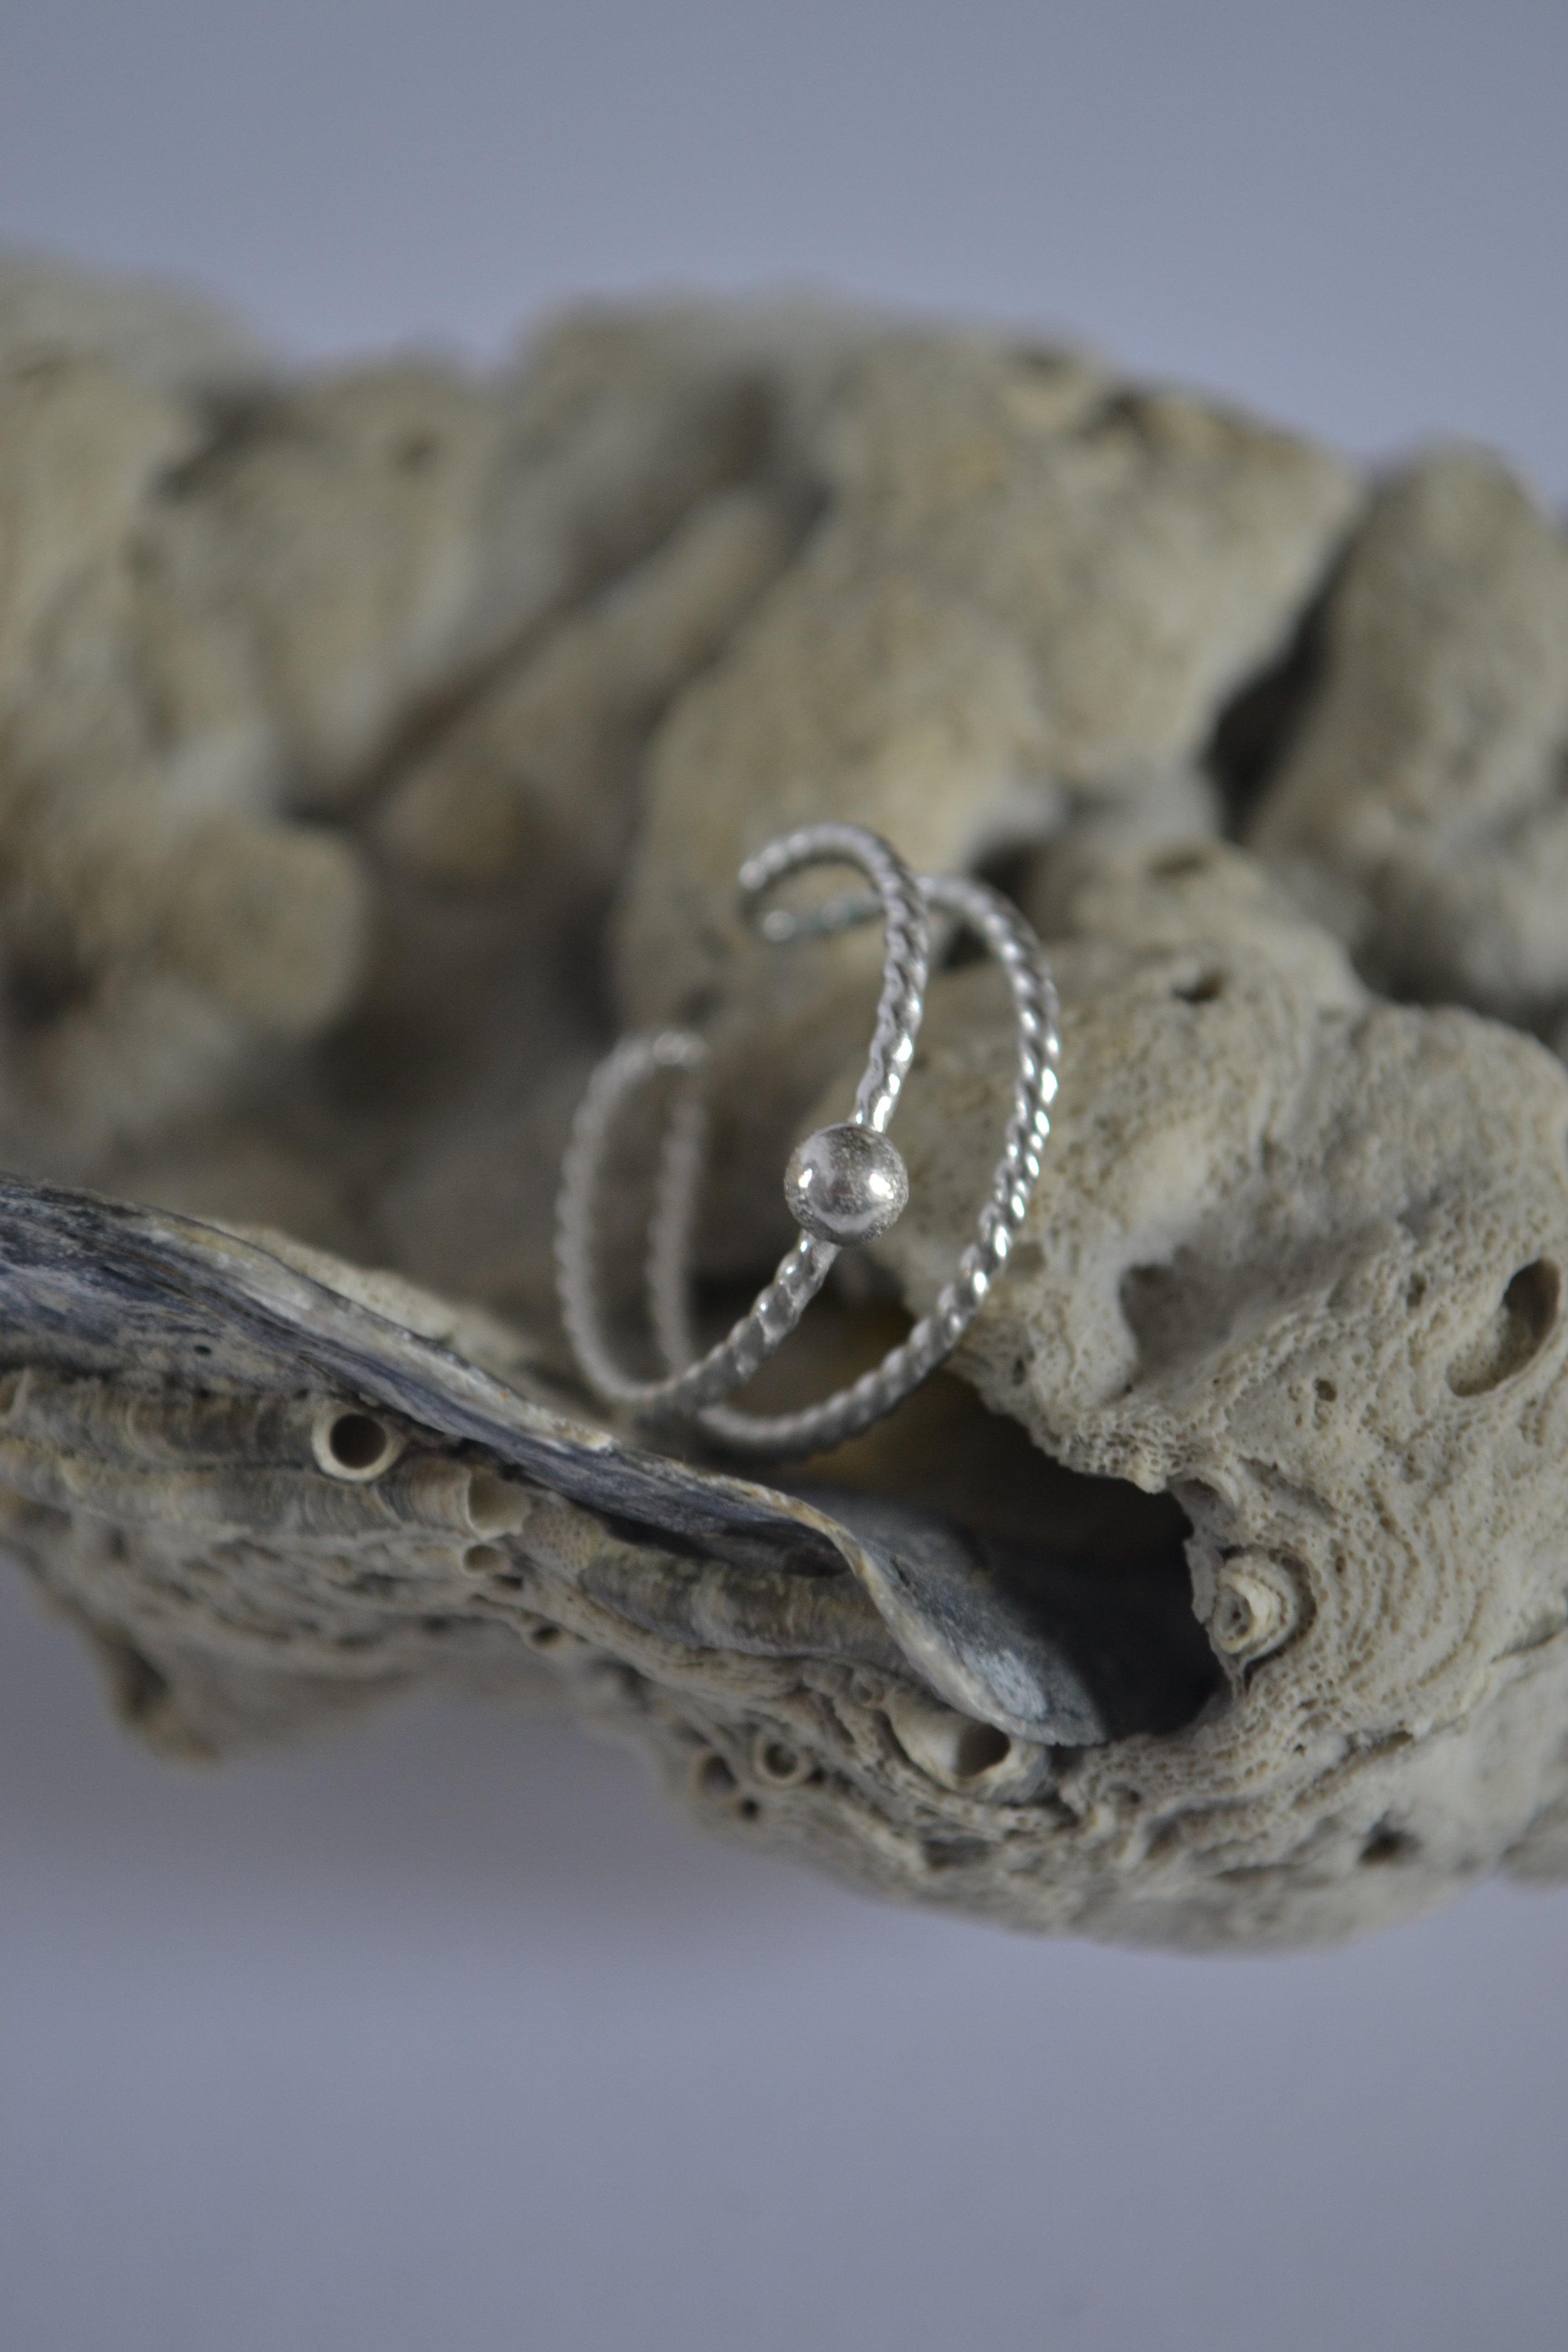 Handcrafted Sterling Silver Adjustable Ring  -  lewdesigns.com.JPG